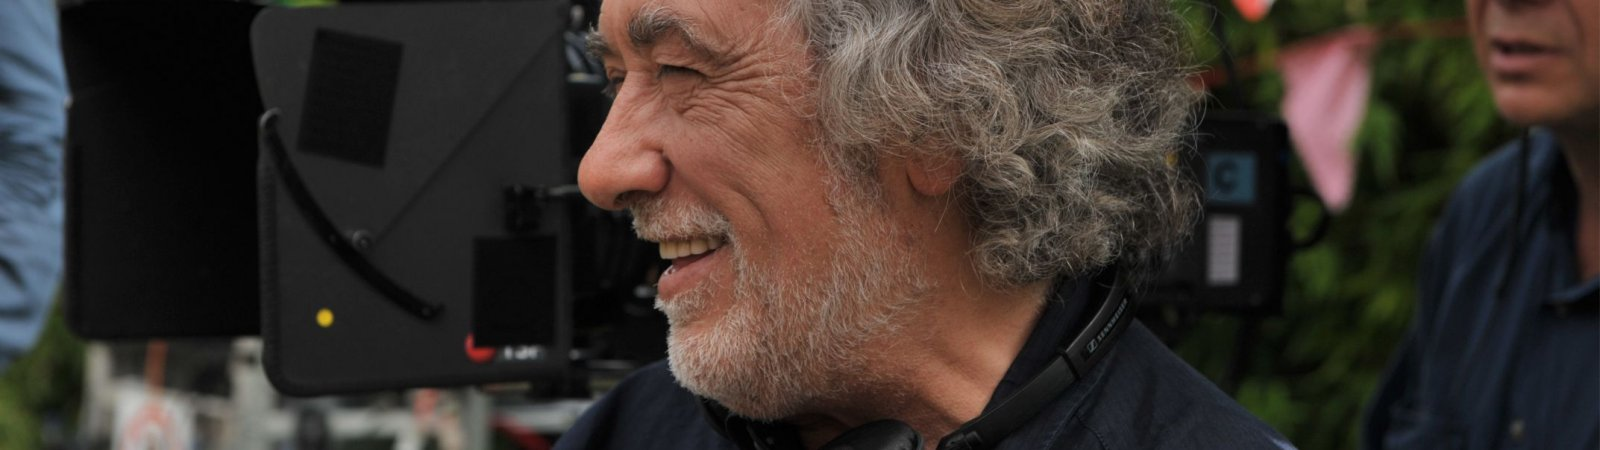 Photo dernier film Marc Esposito